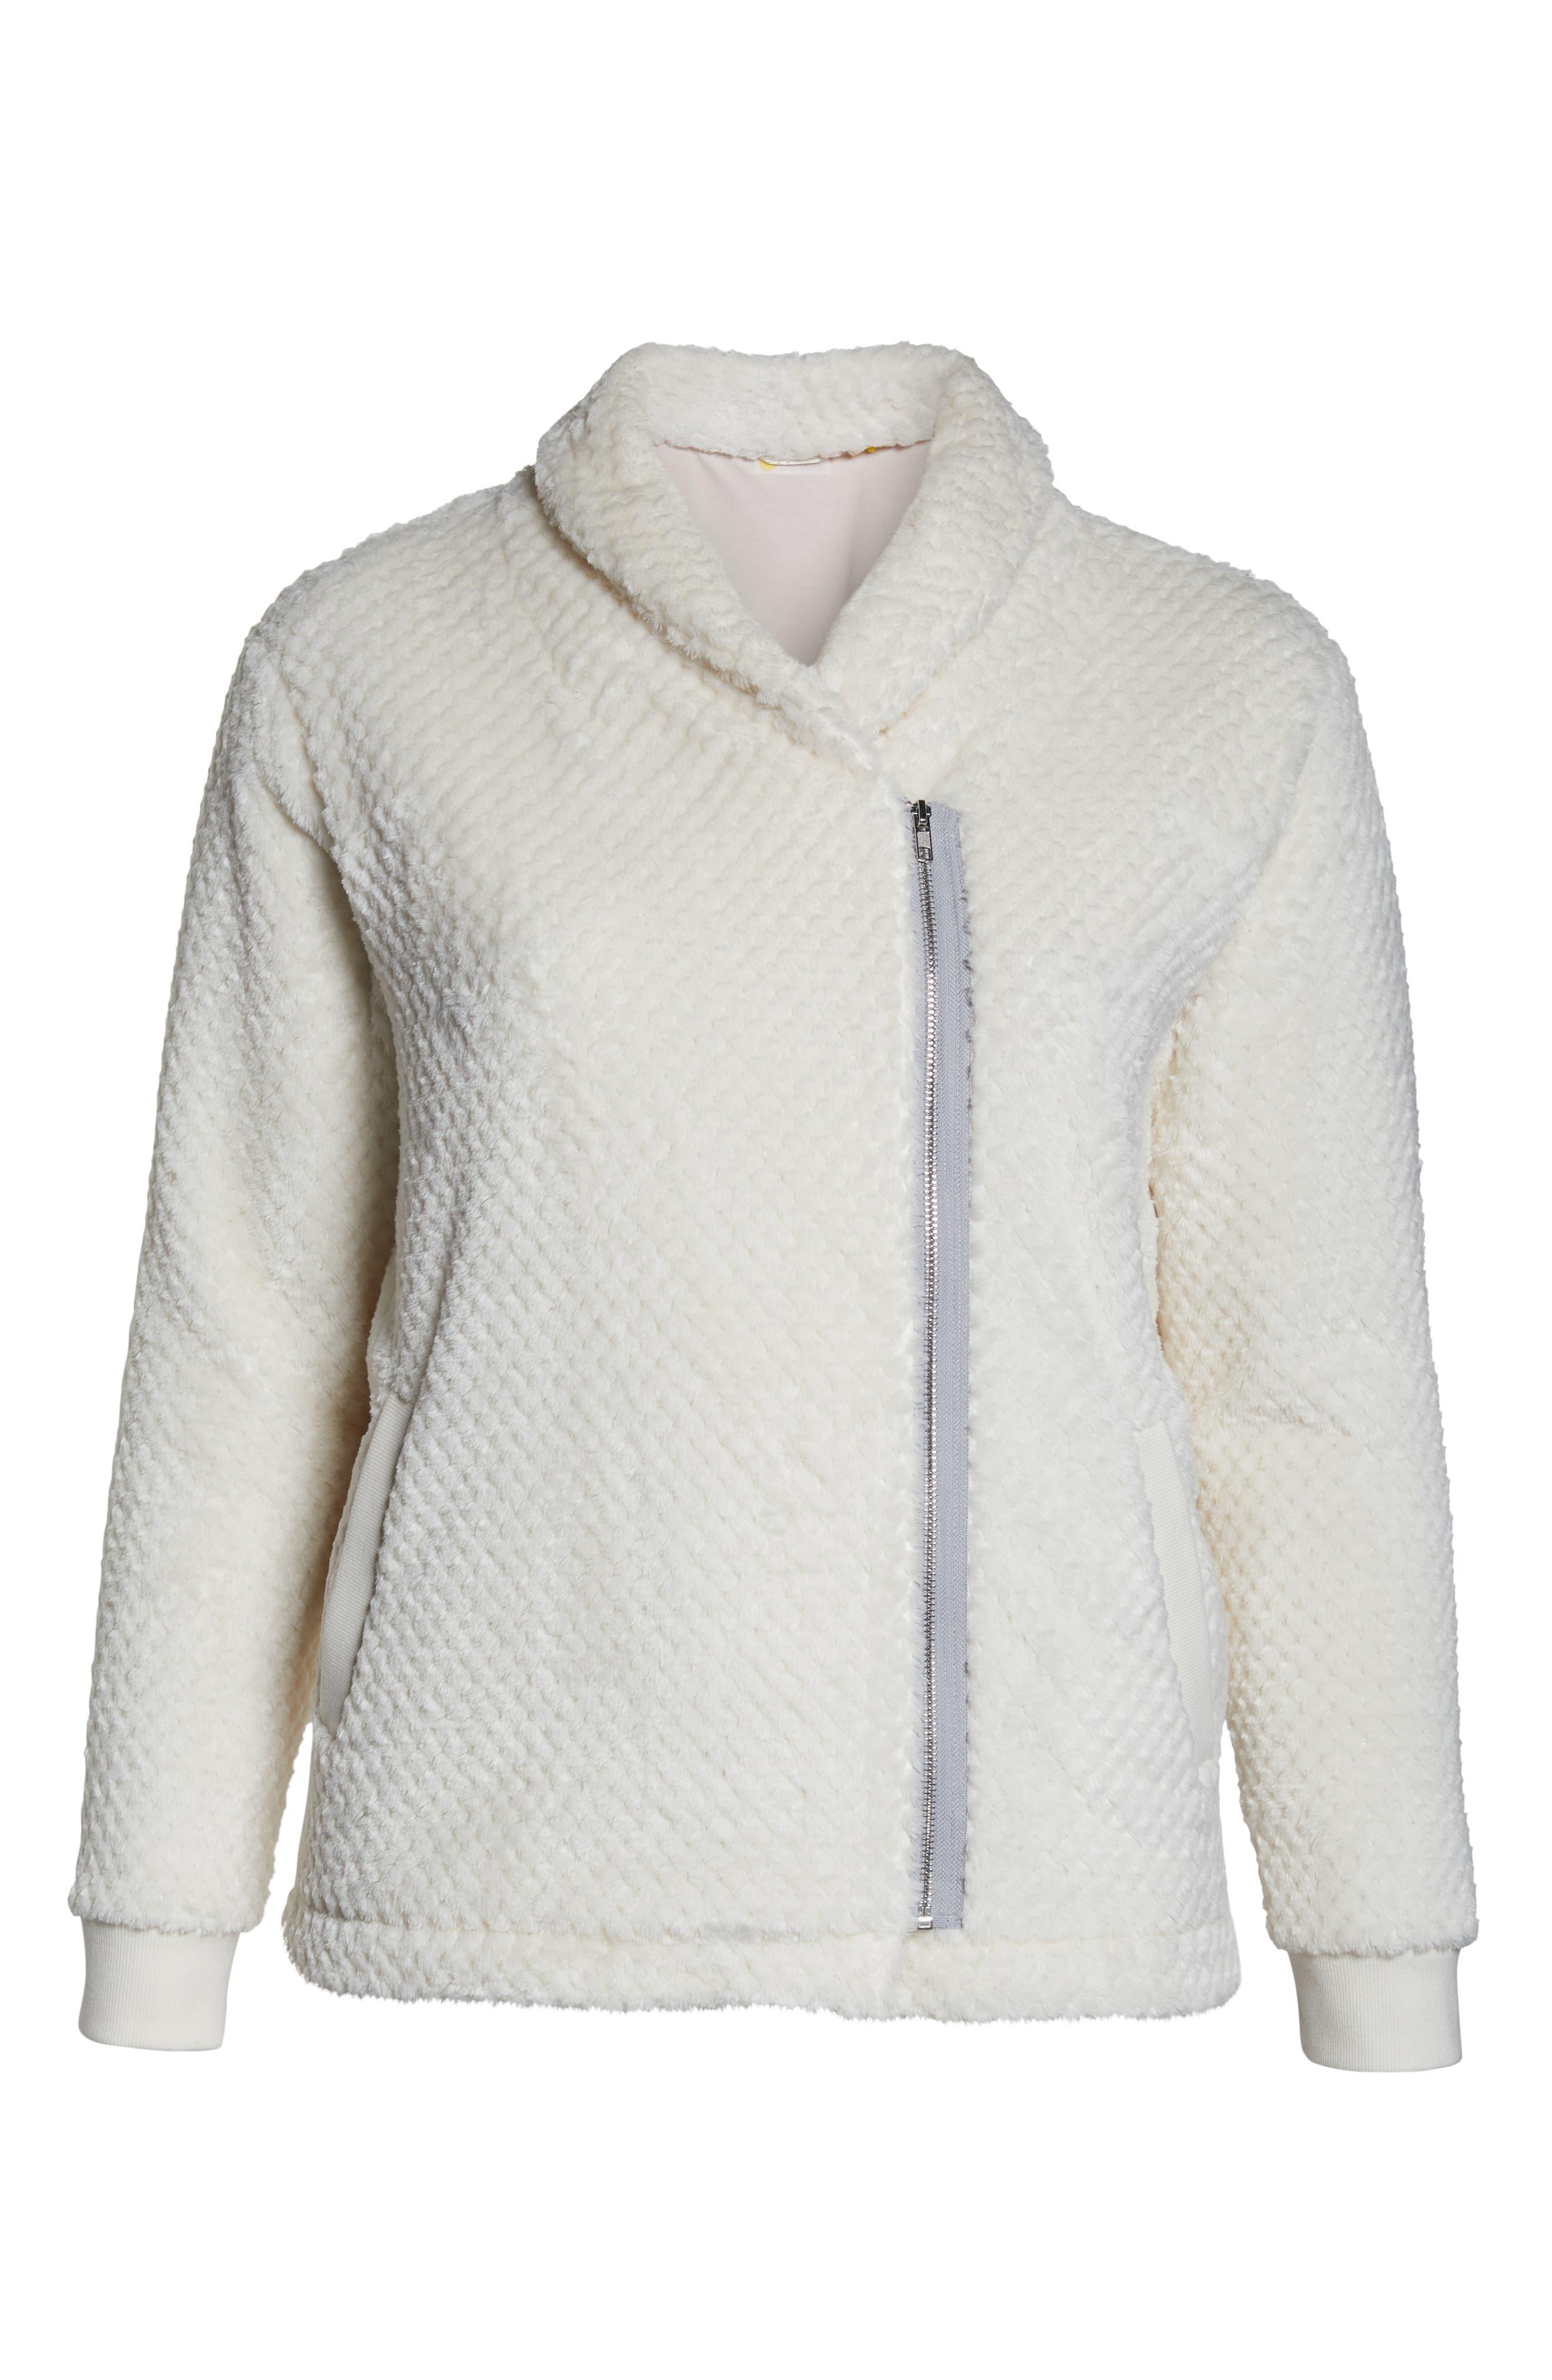 ZELLA,                             Diamond Fleece Jacket,                             Alternate thumbnail 9, color,                             IVORY CLOUD